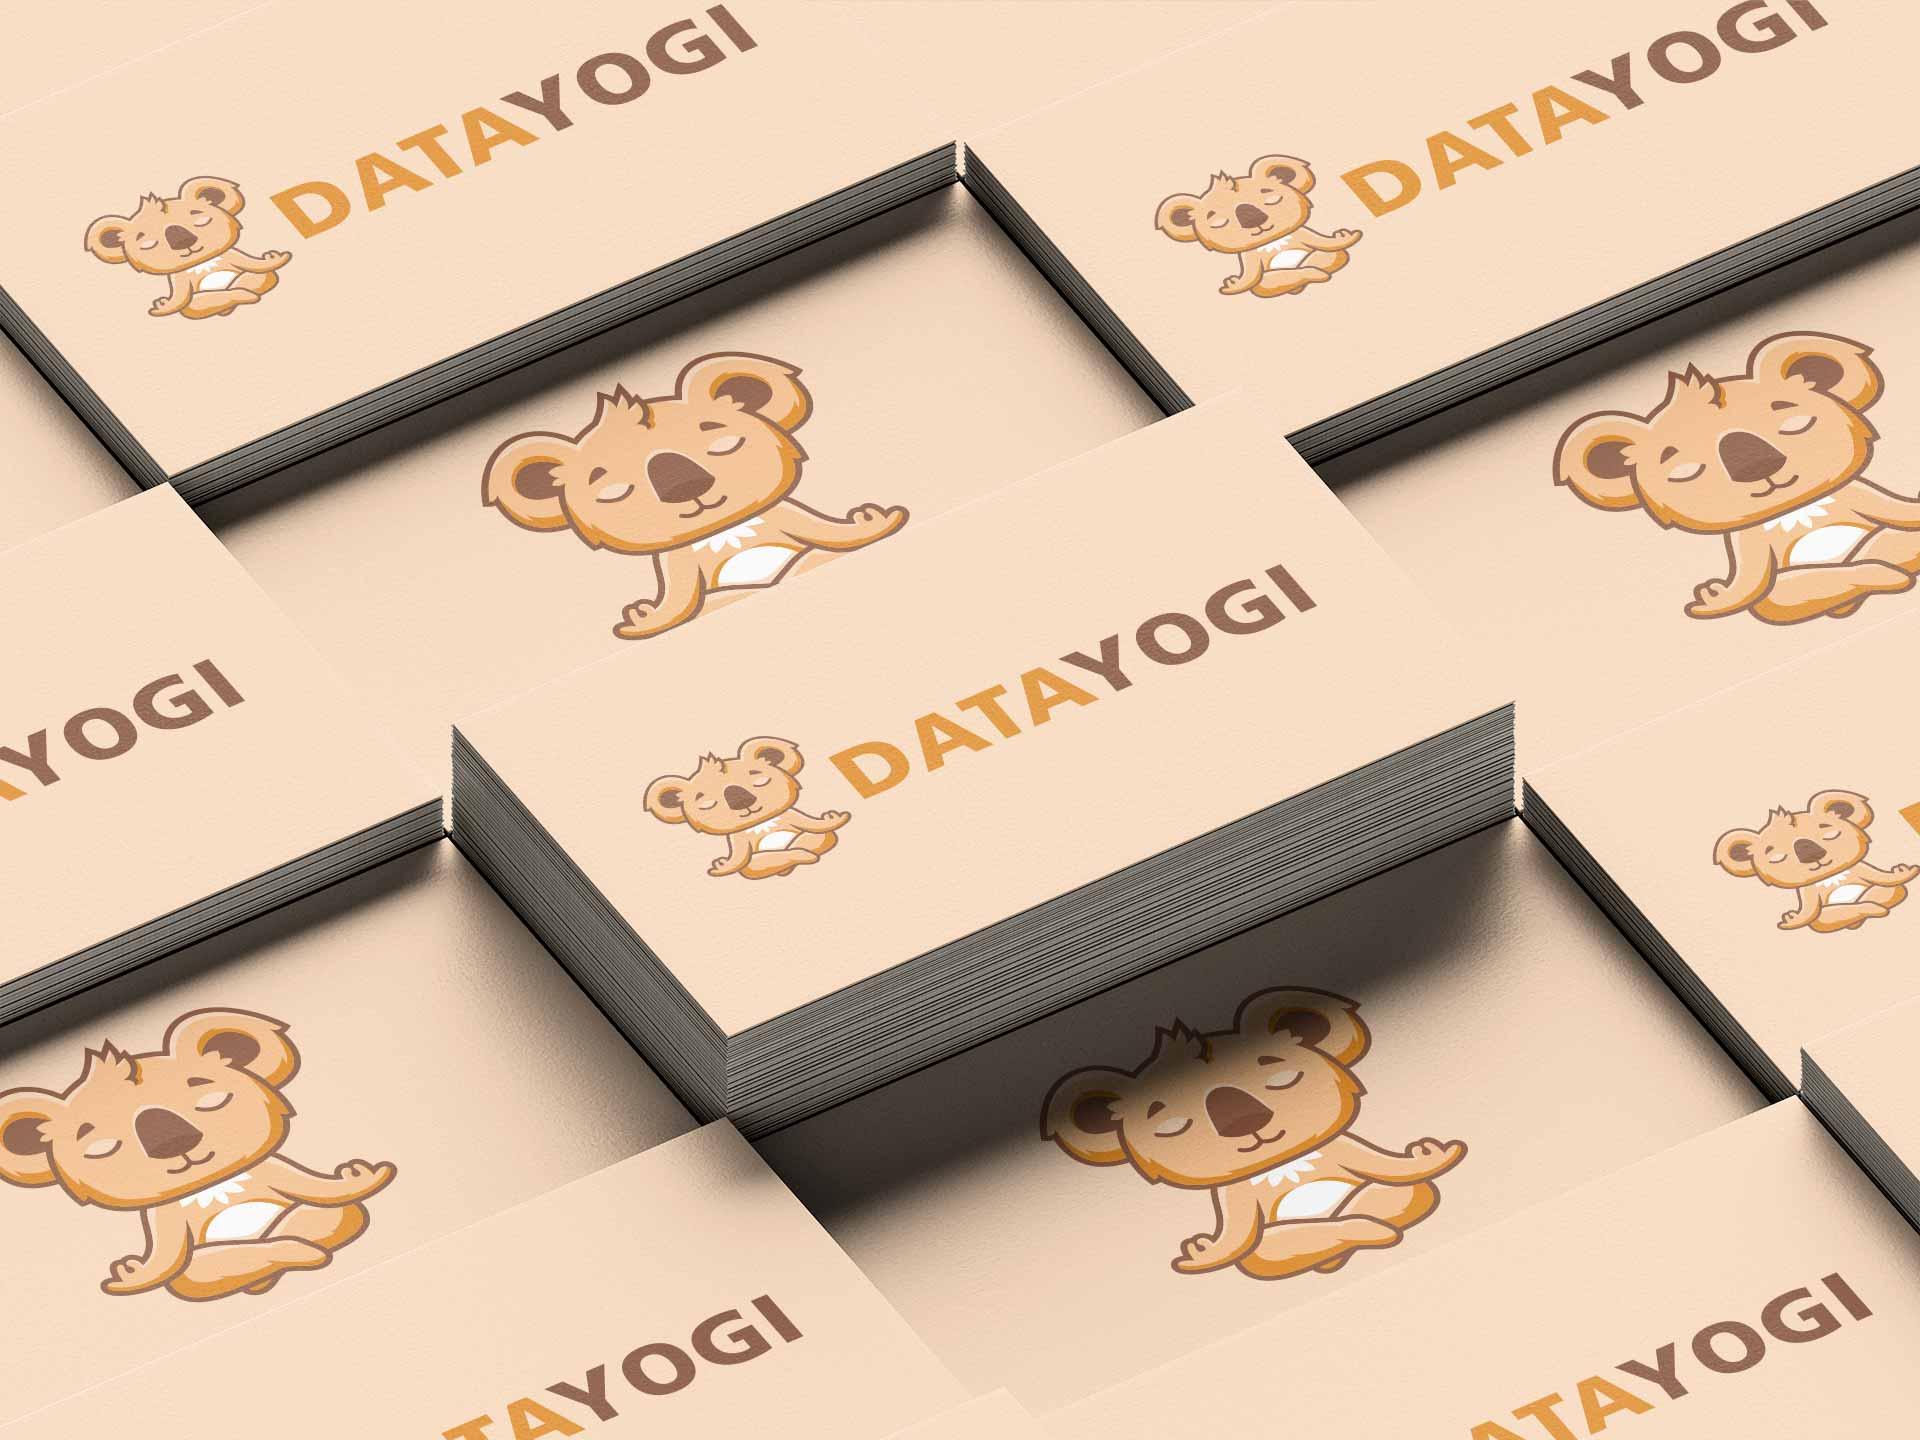 DataYogi Website Business Cards